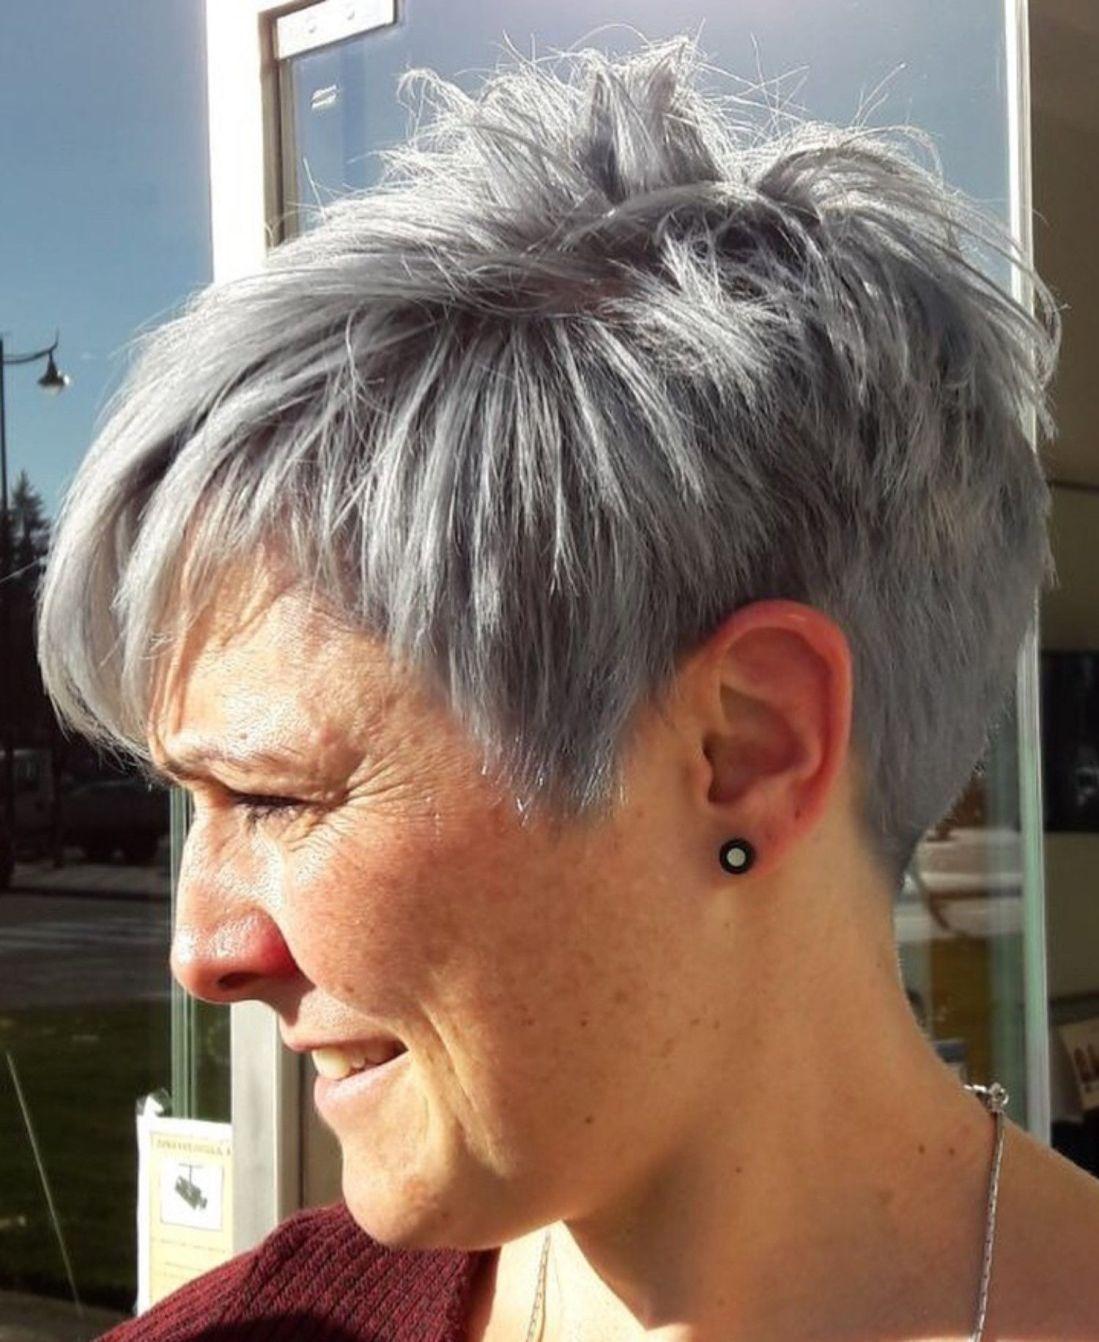 10 Ideeen Over Kapsel Kapsels Kort Haar Kapsels Kapsels Voor Kort Haar